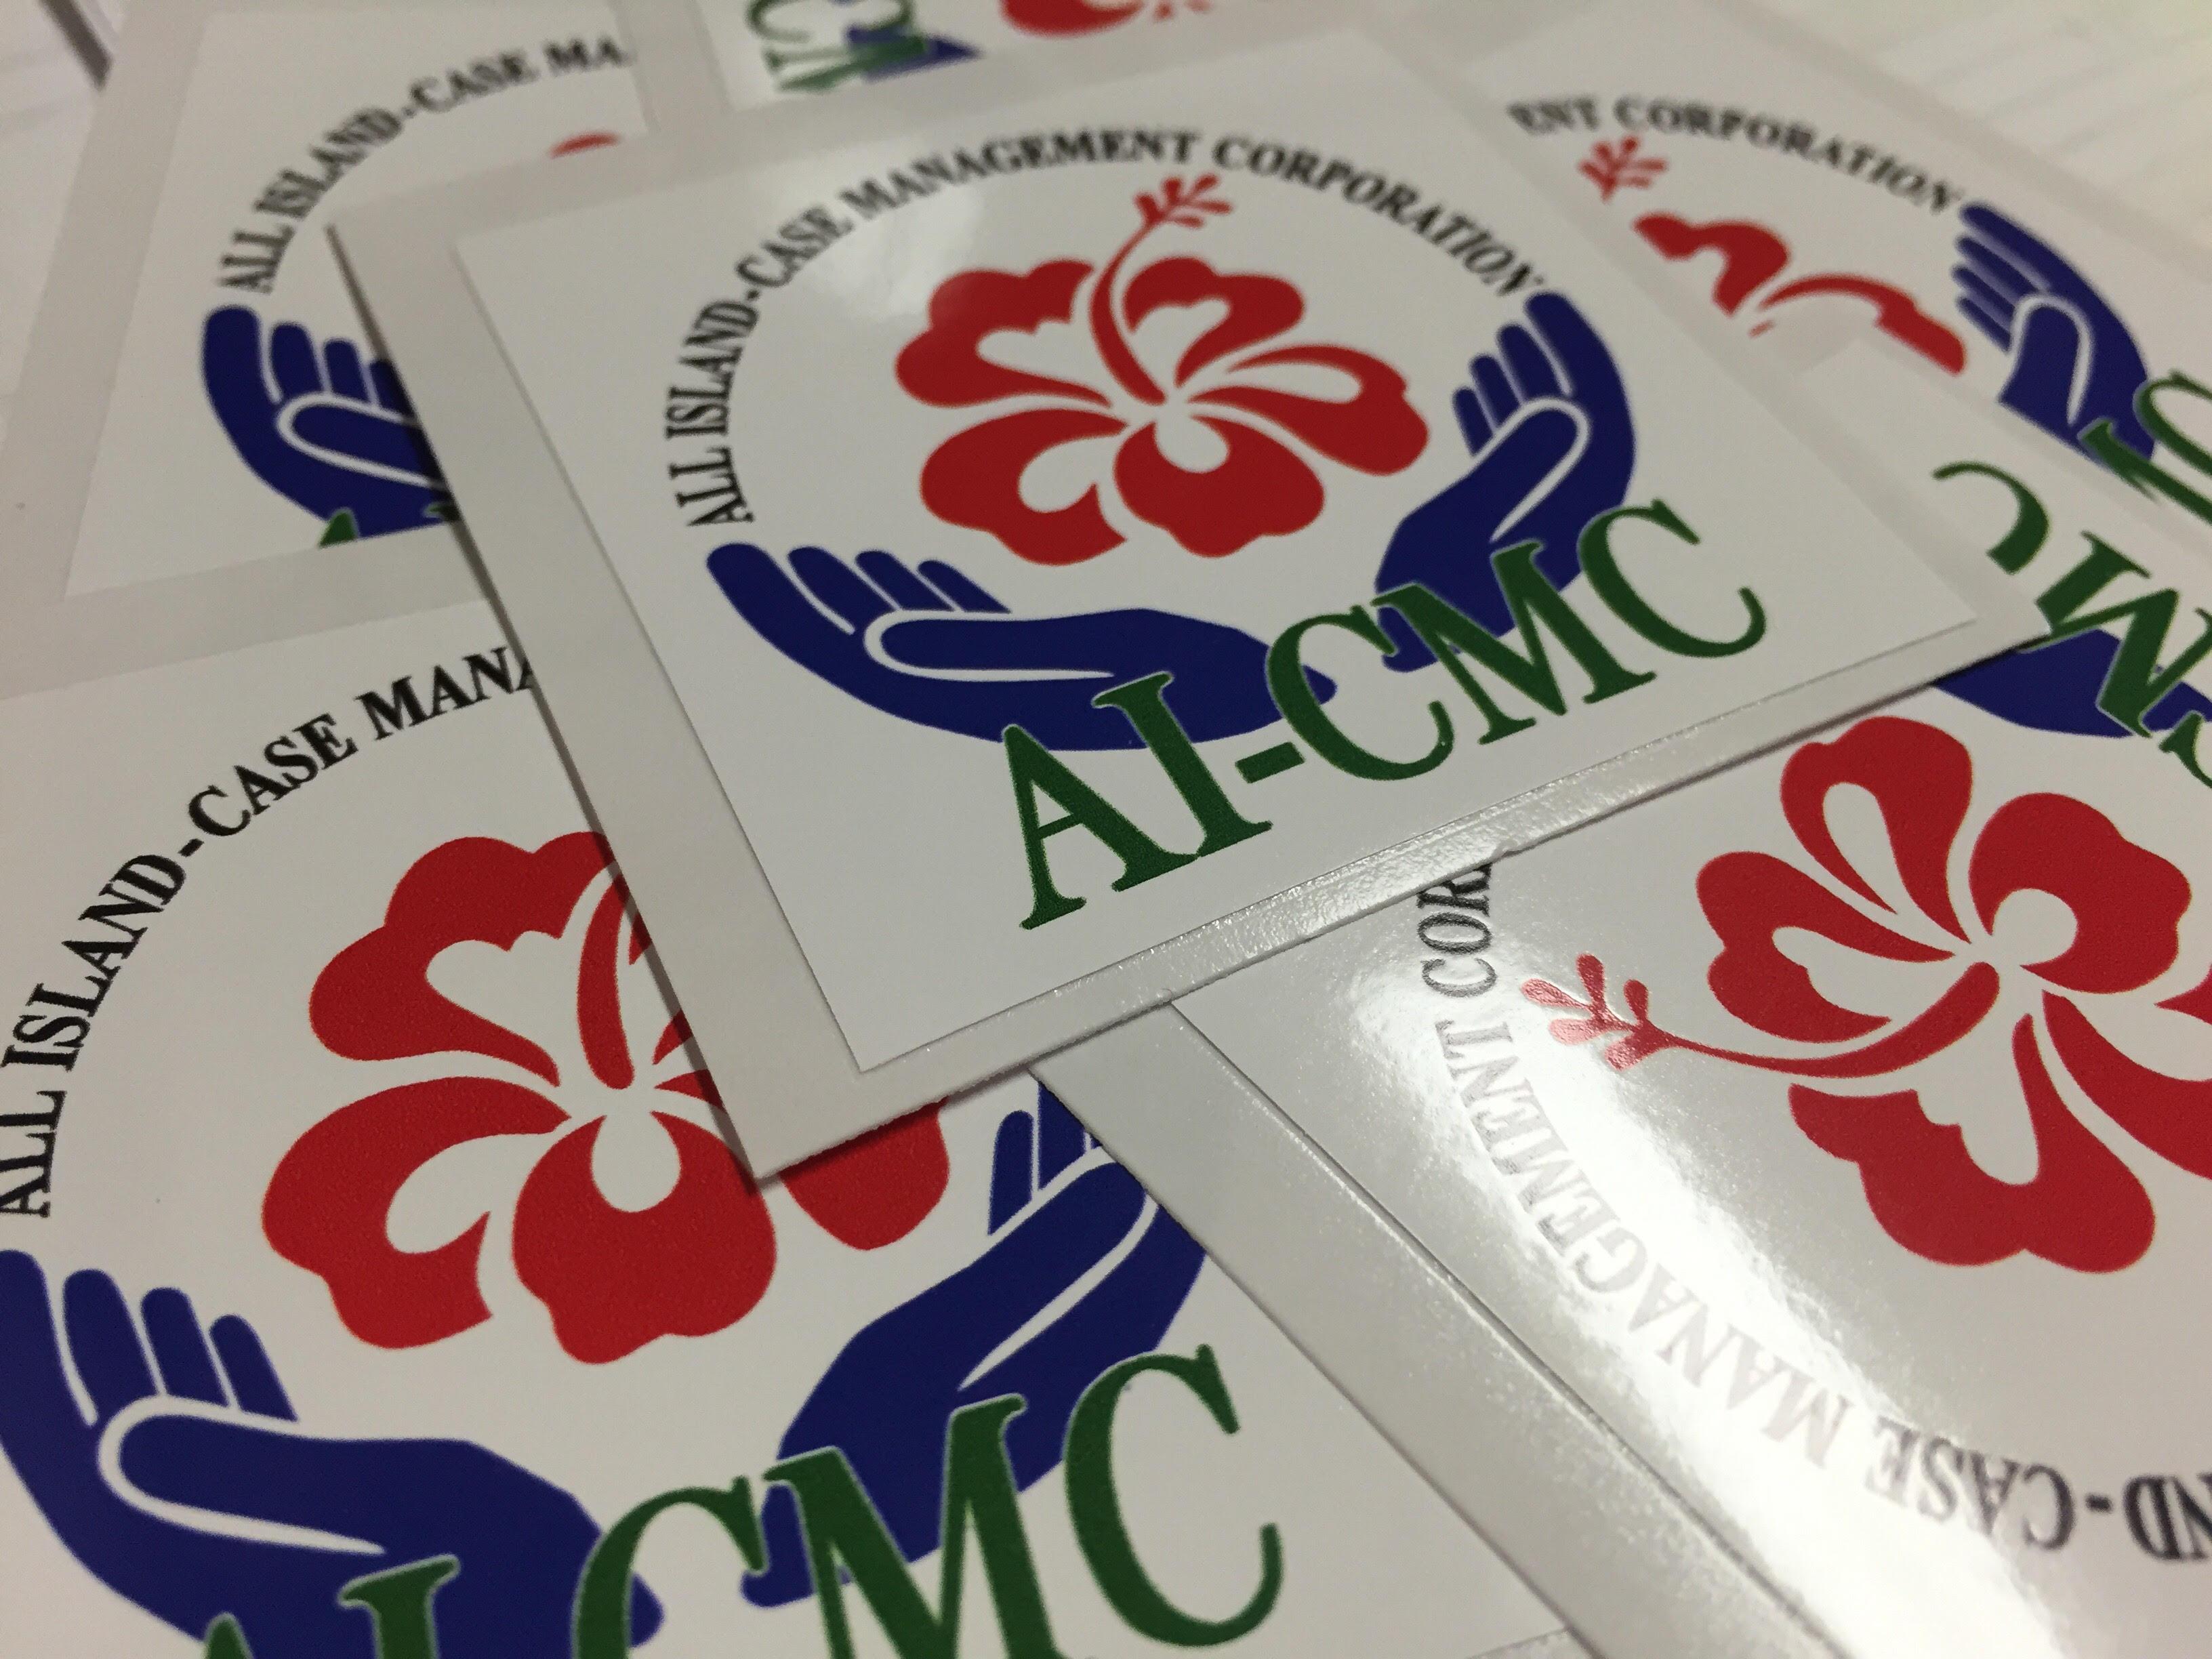 AICMC